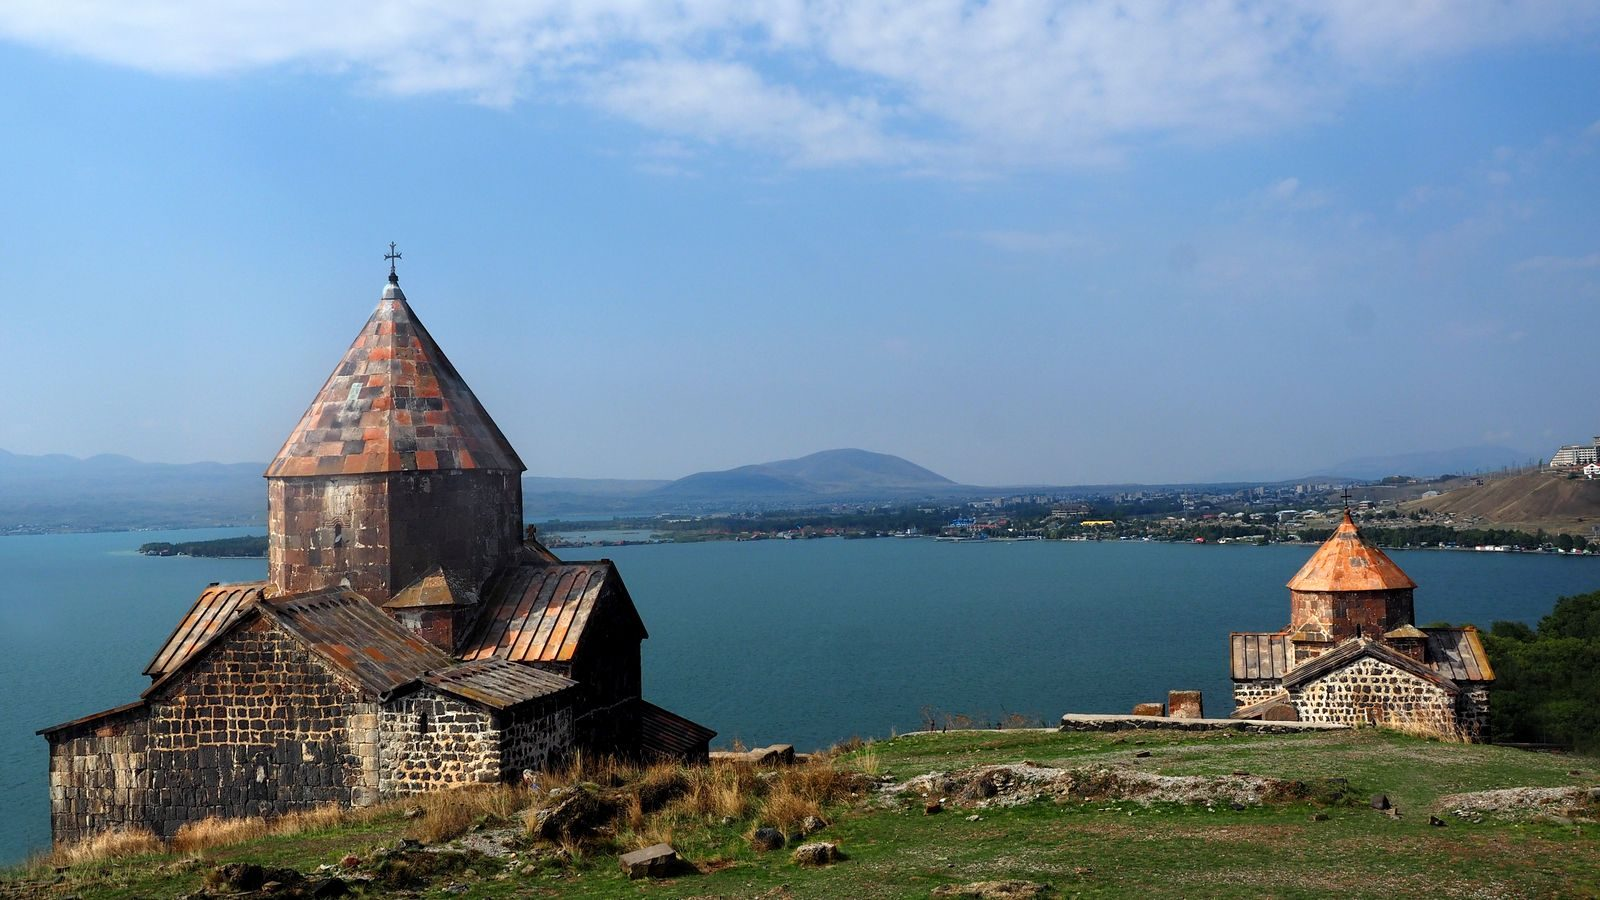 Radreise Armenien - Kloster Sewanawank, Sewansee